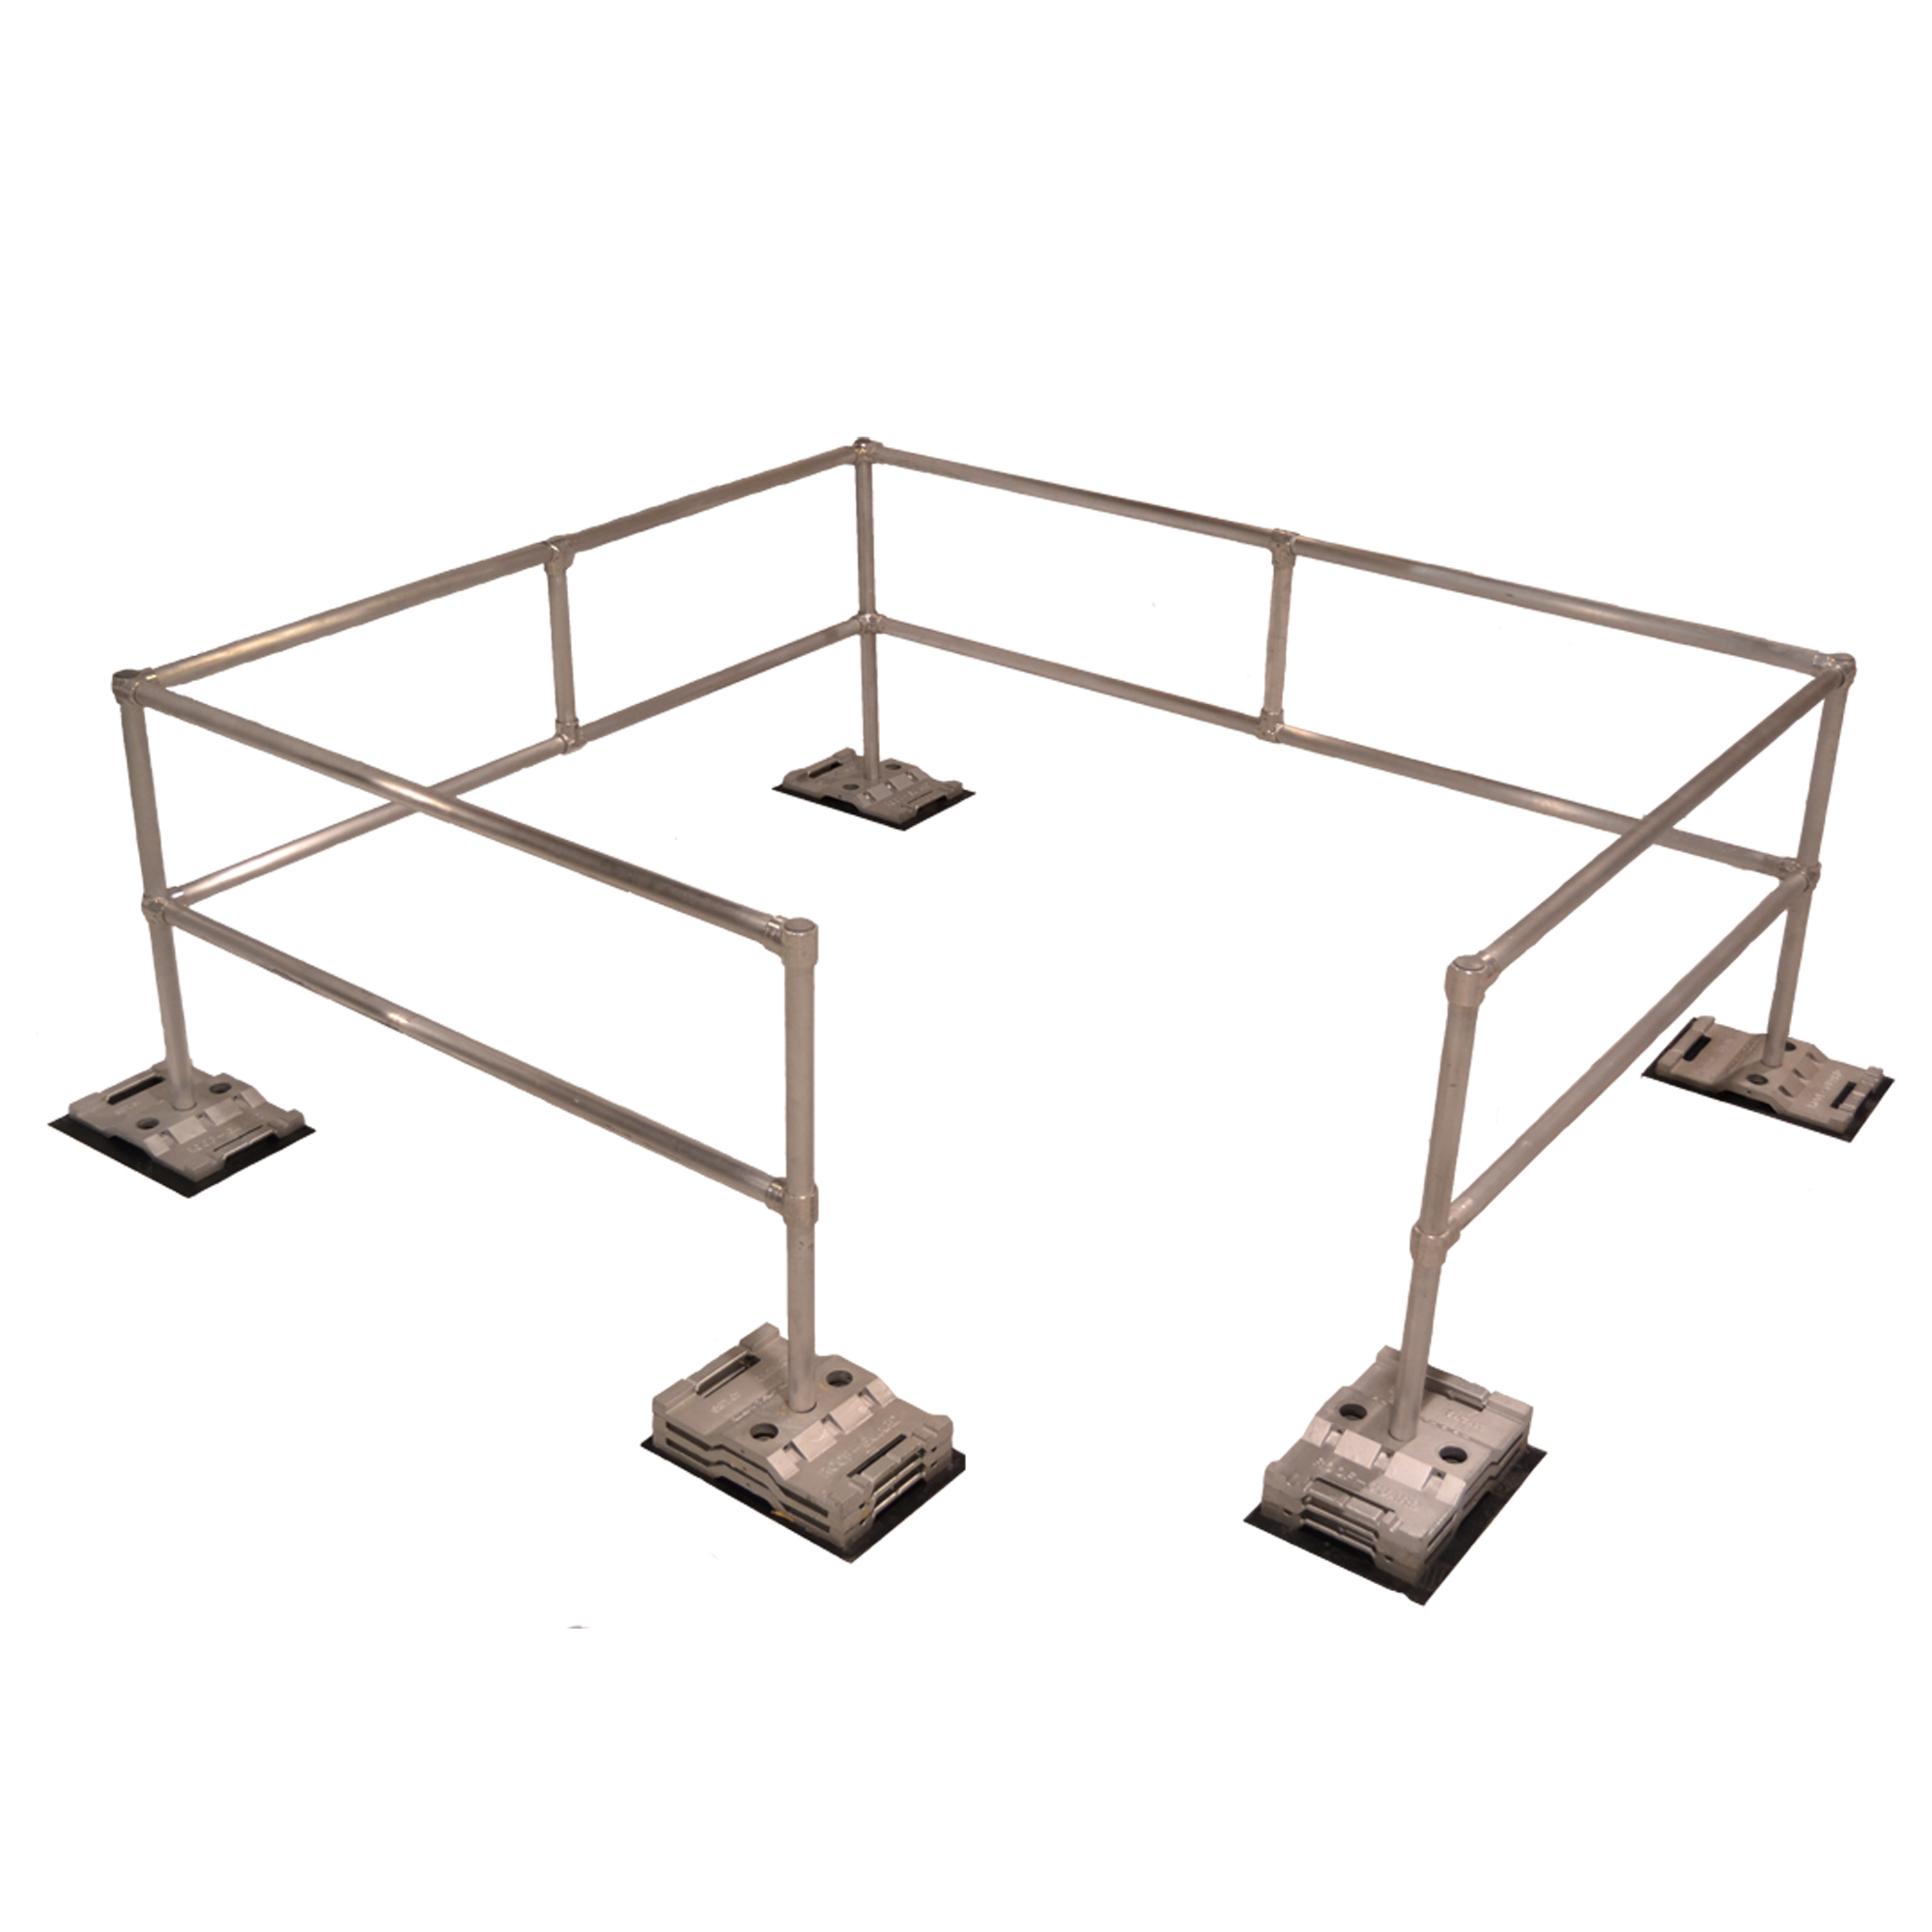 Rooftop Guardrail 18 Foot Kit